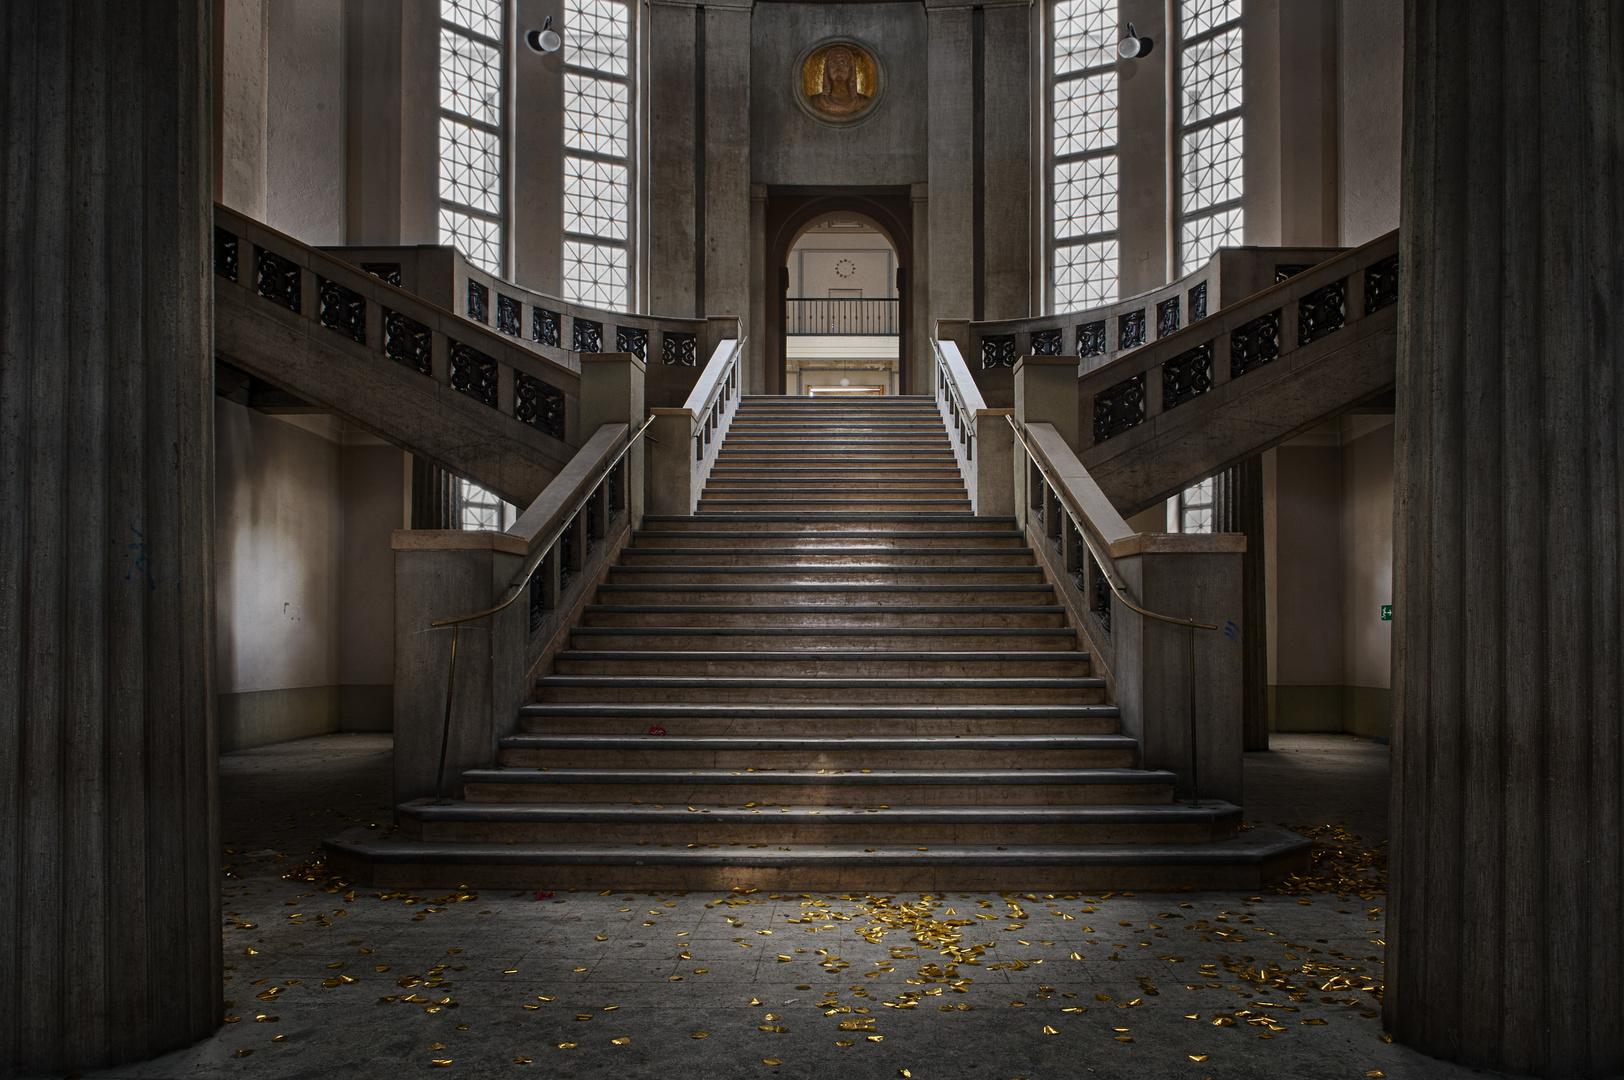 Der Treppenaufgang ....